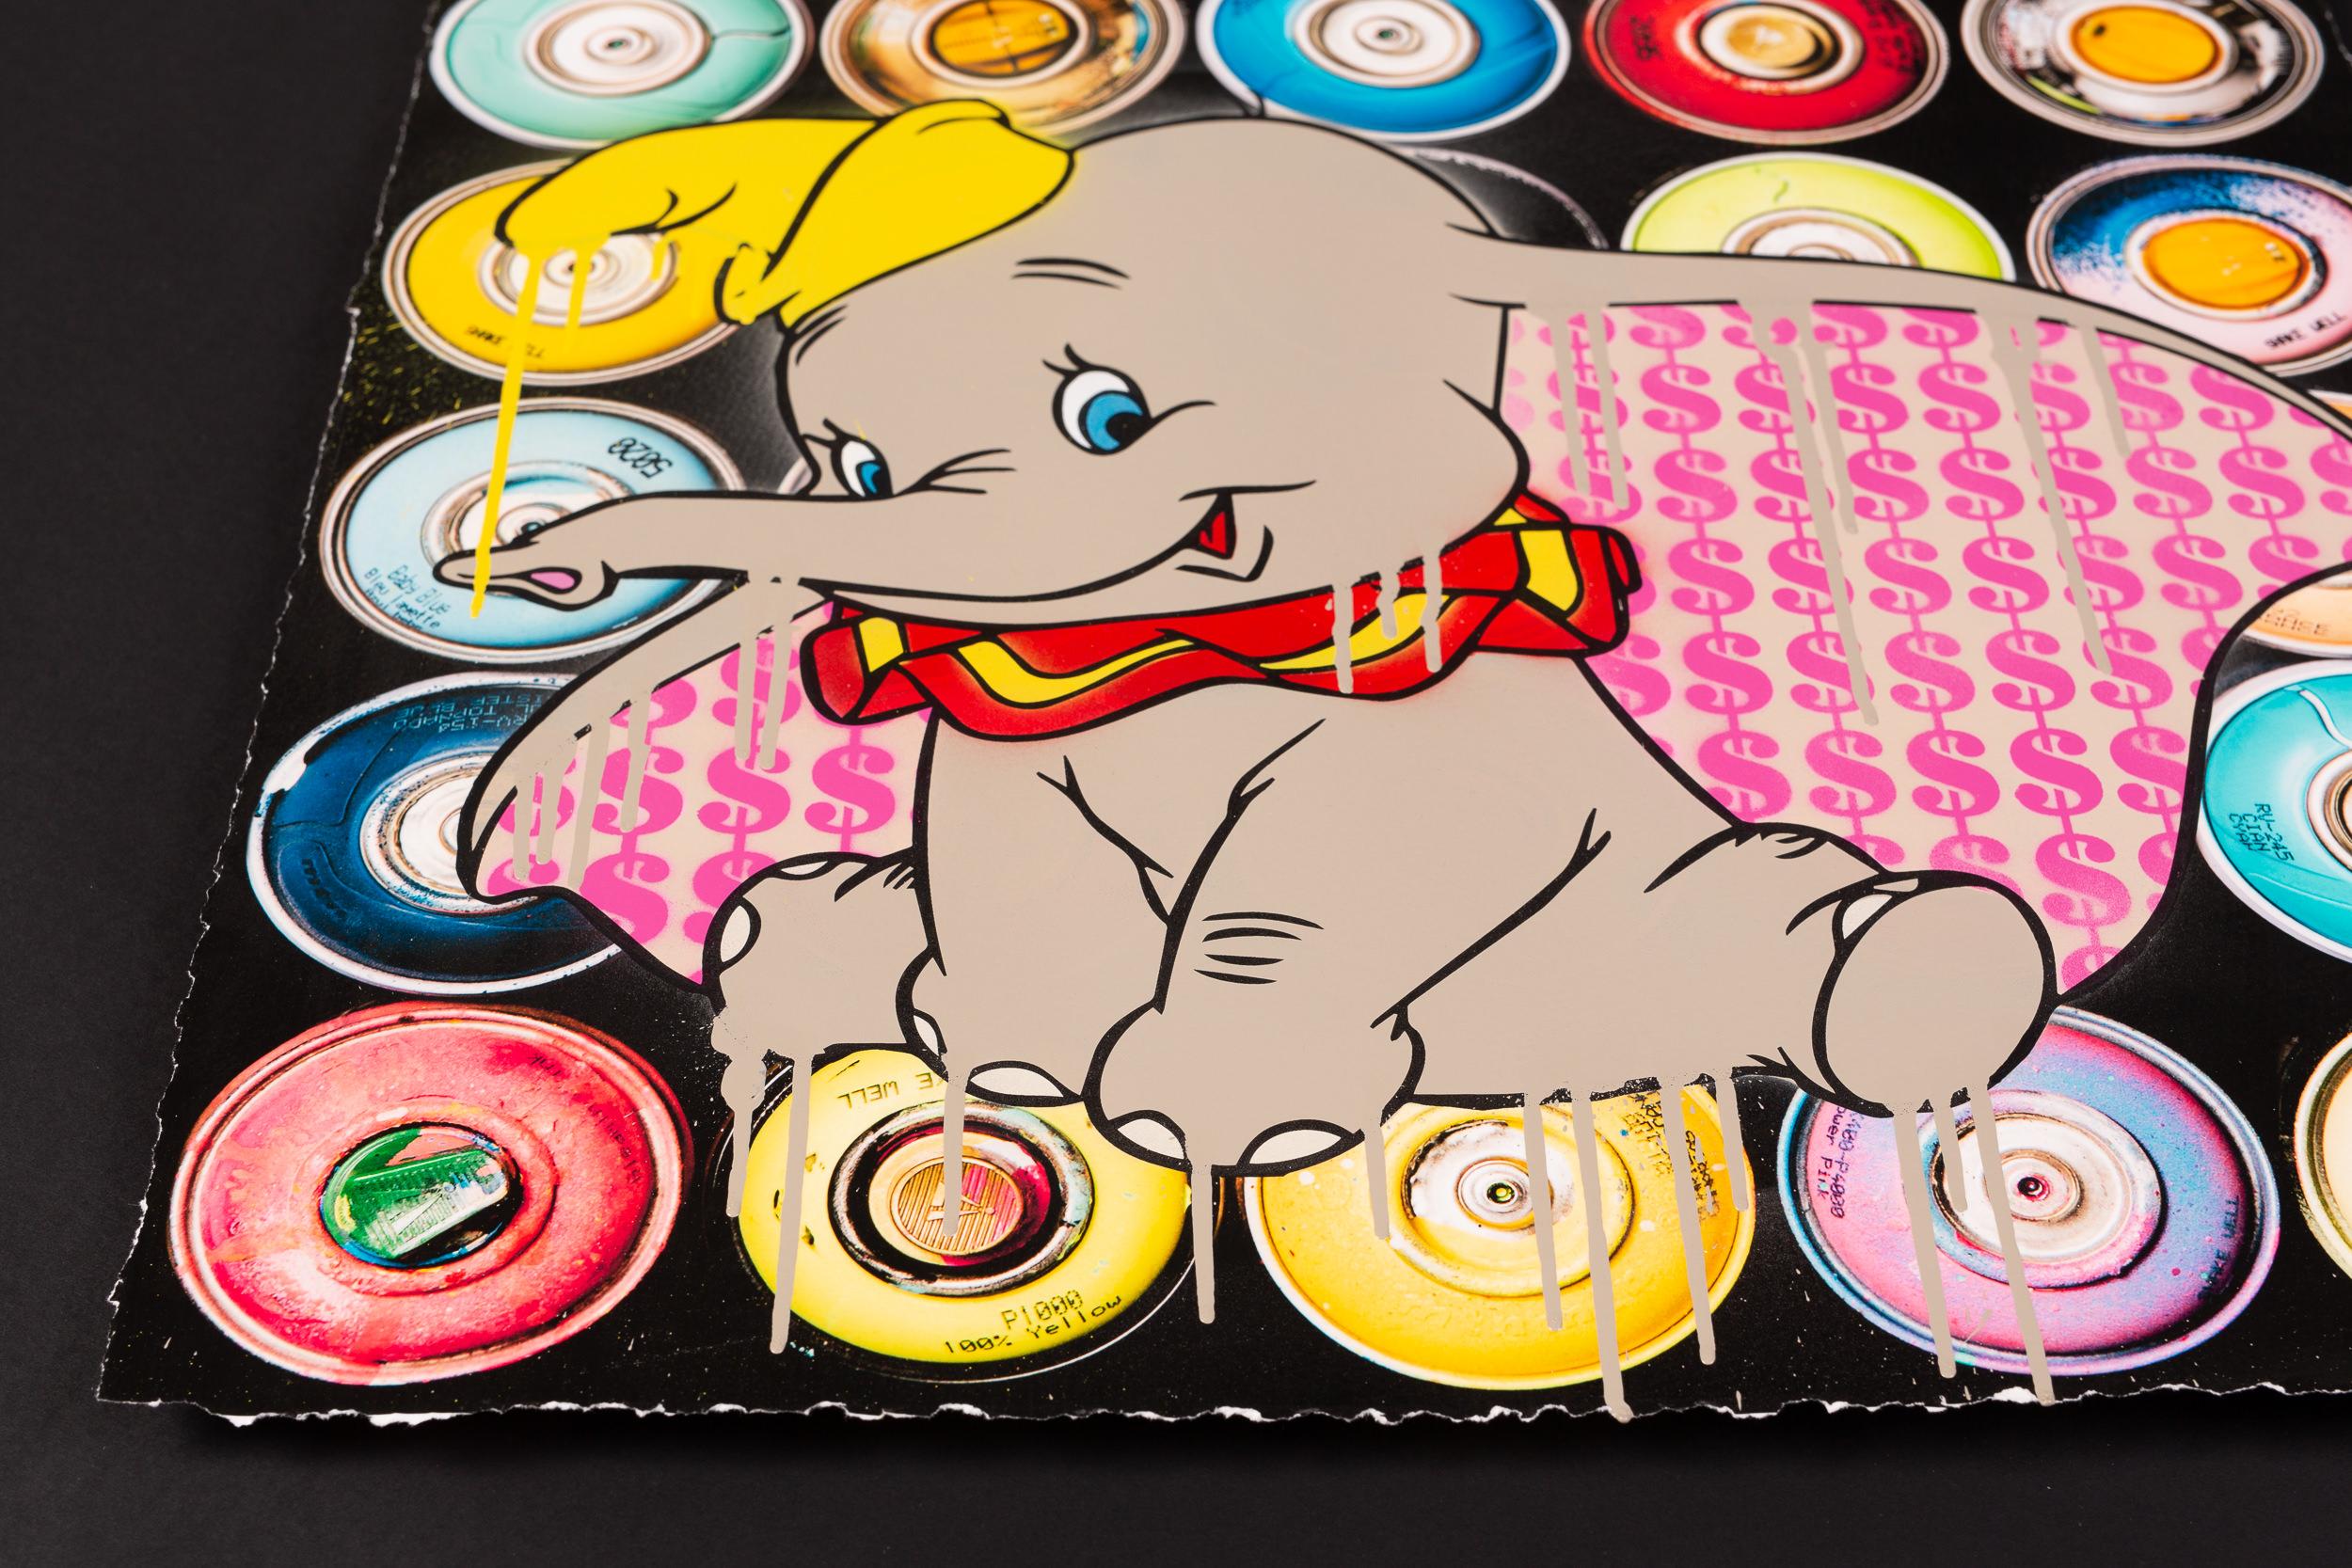 Popaganda-Cans-Dumbo-Detail-02.jpg